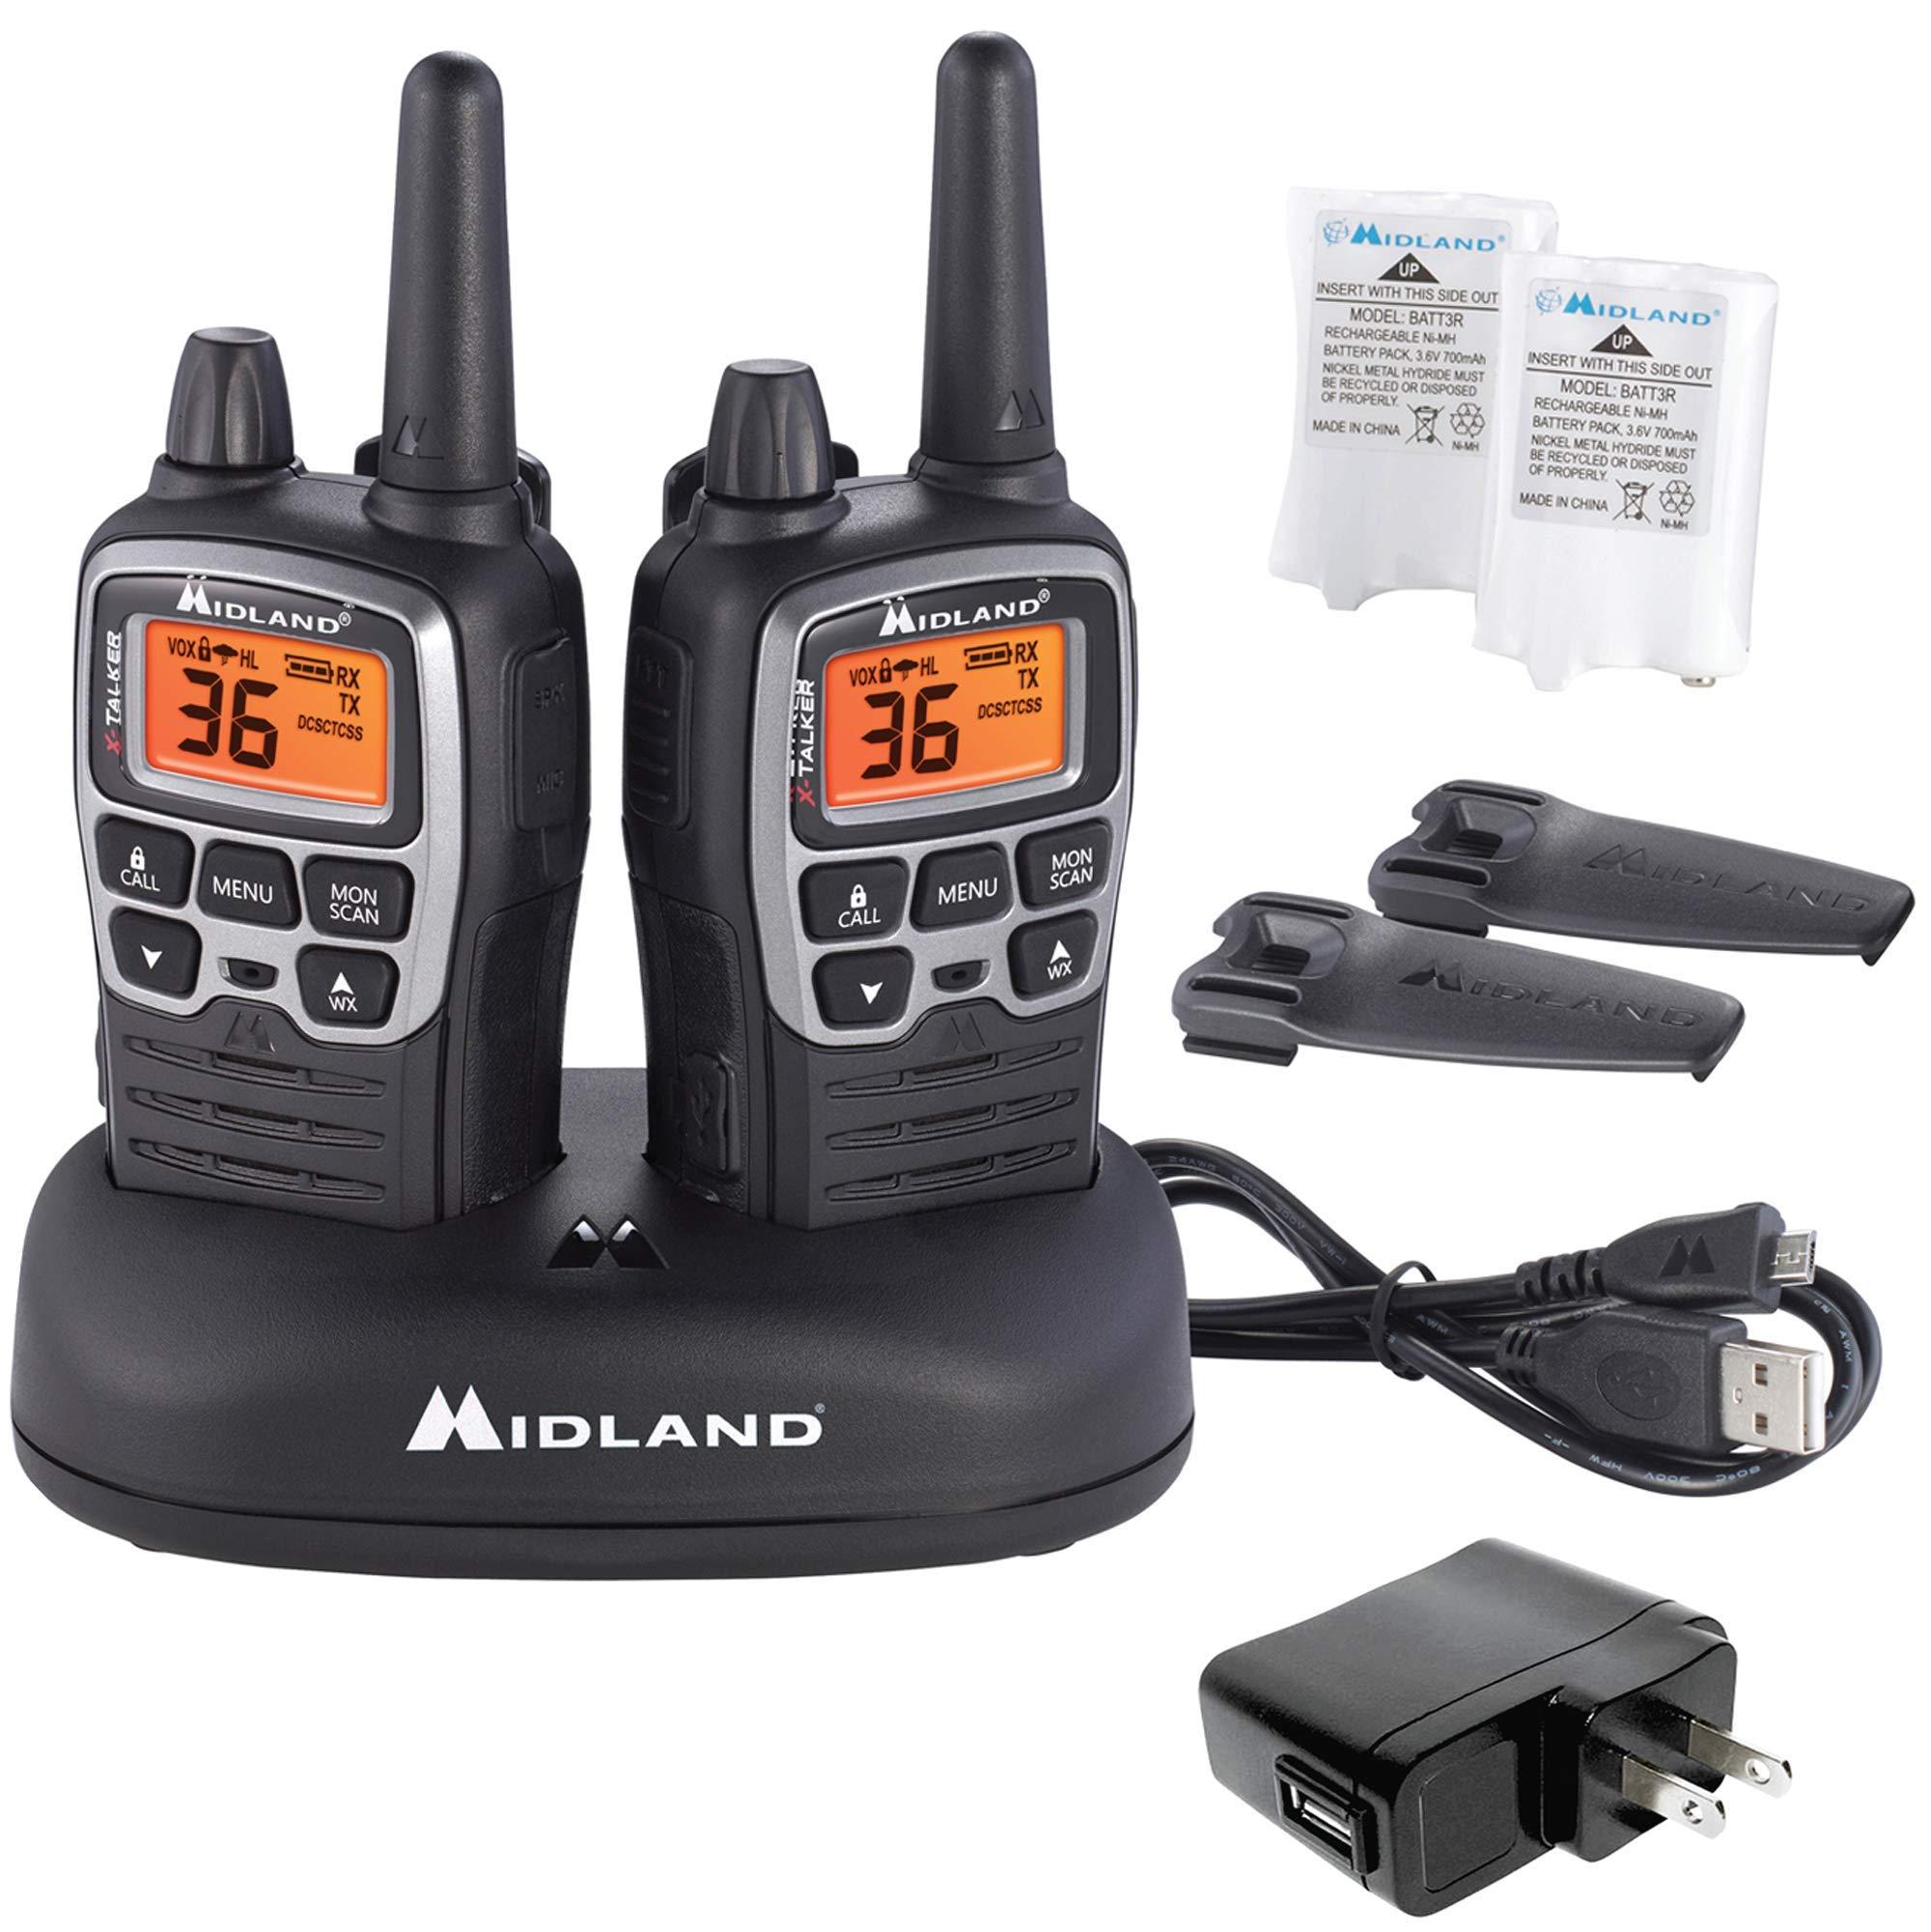 Midland - X-TALKER T71VP3, 36 Channel FRS Two-Way Radio - Up to 38 Mile Range Walkie Talkie, 121 Privacy Codes, NOAA Weather Scan + Alert (Pair Pack) (Black/Silver) by Midland